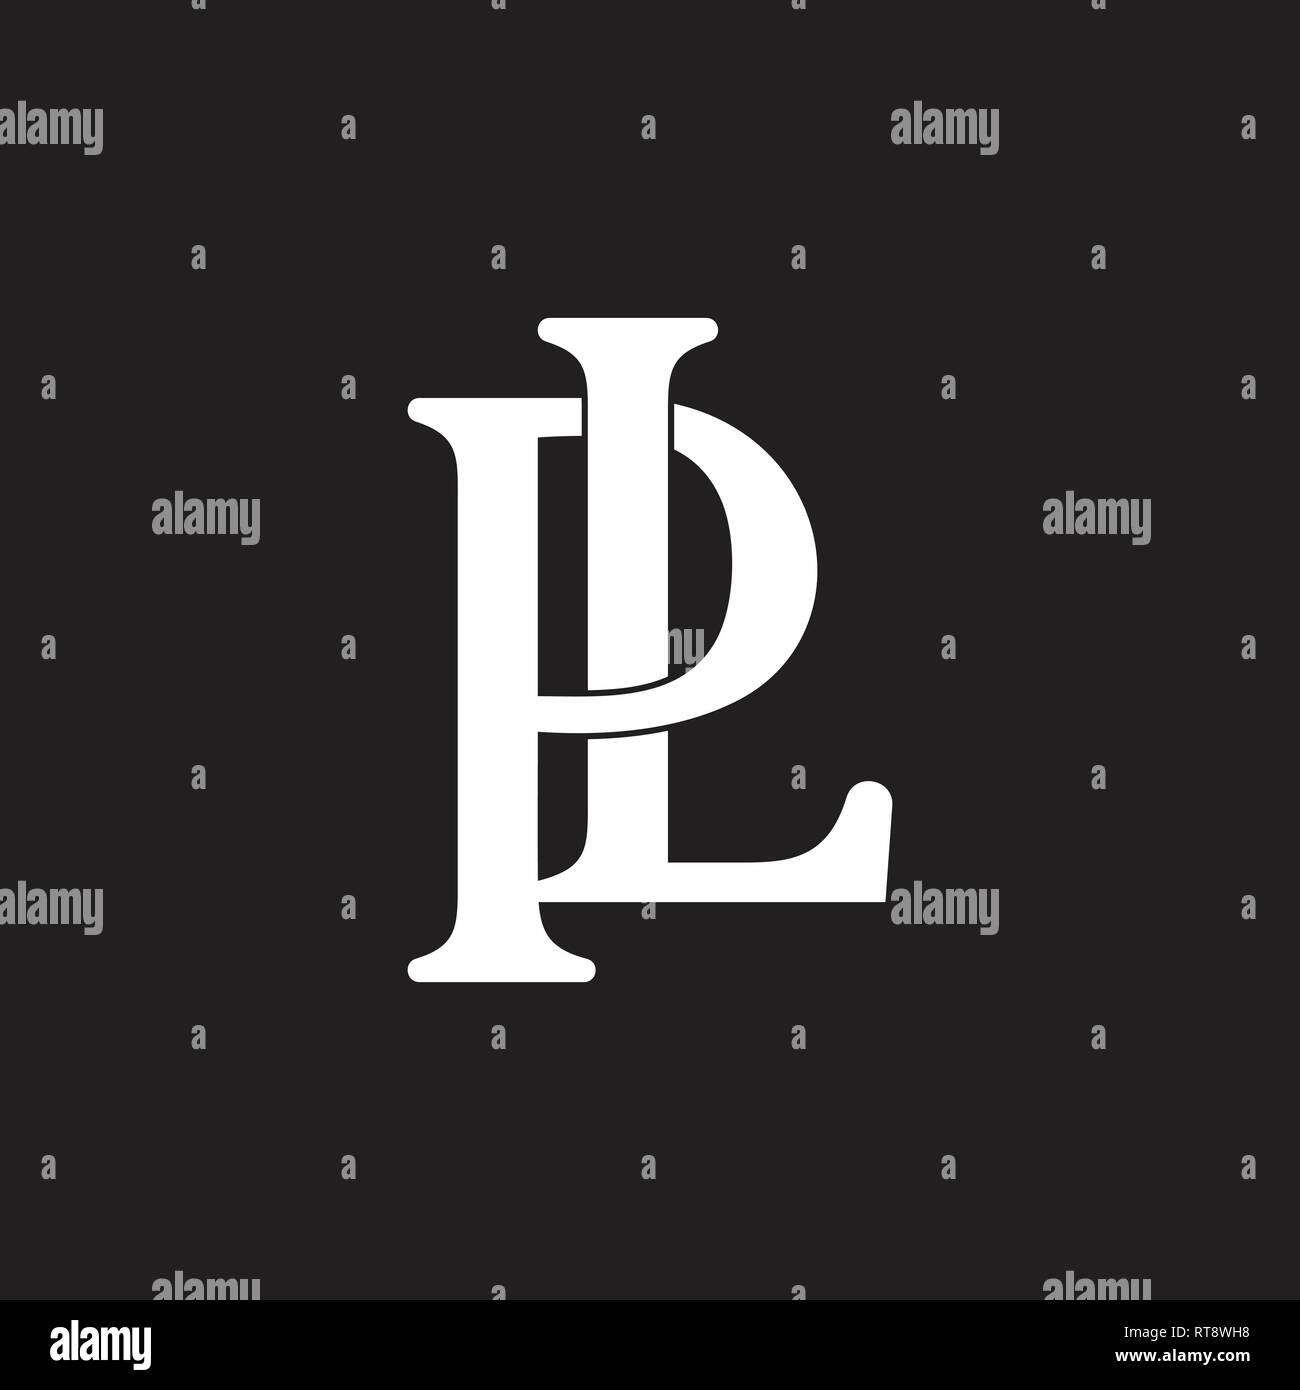 letters pl linked design logo vector Stock Vector